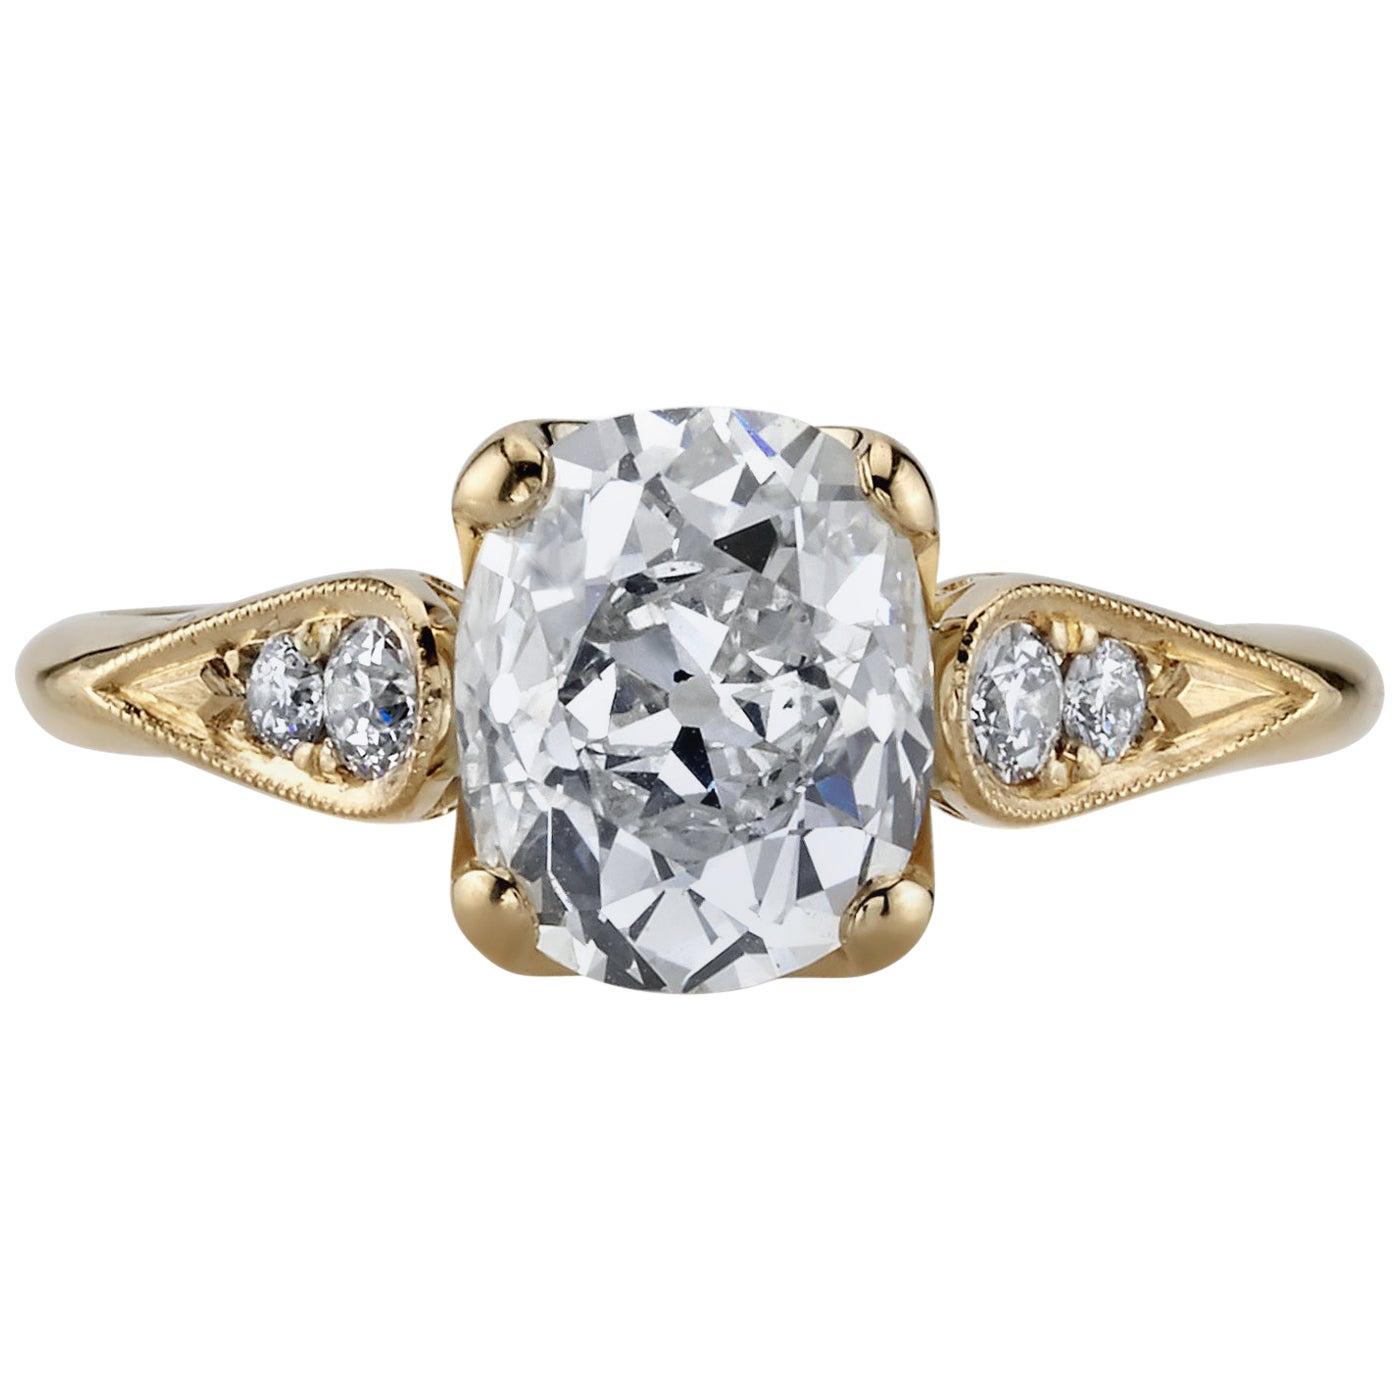 1.86 Carat GIA Certified Cushion Cut Diamond in an 18 Karat Yellow Gold Ring